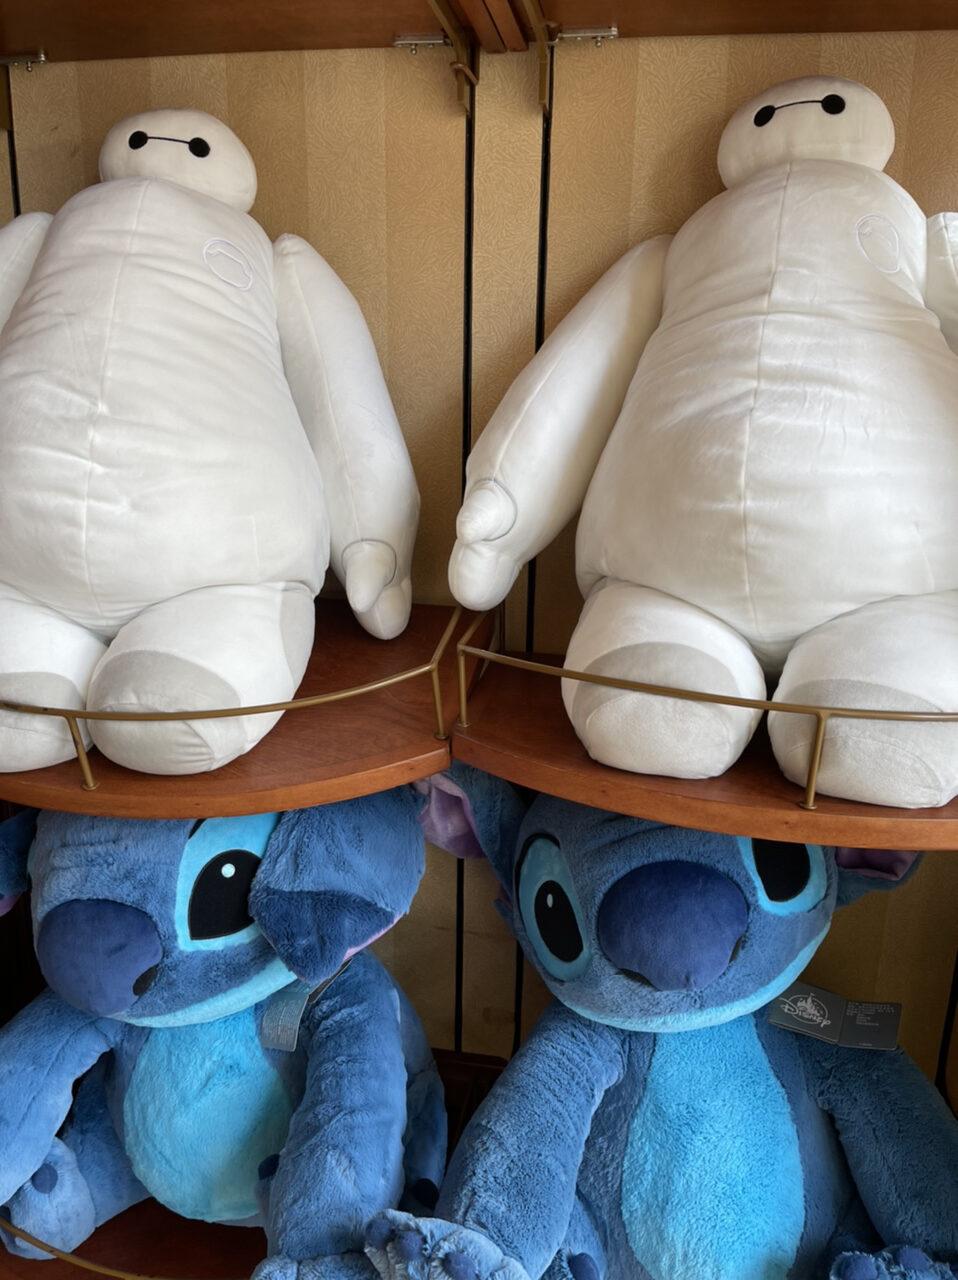 Disney character plush toys